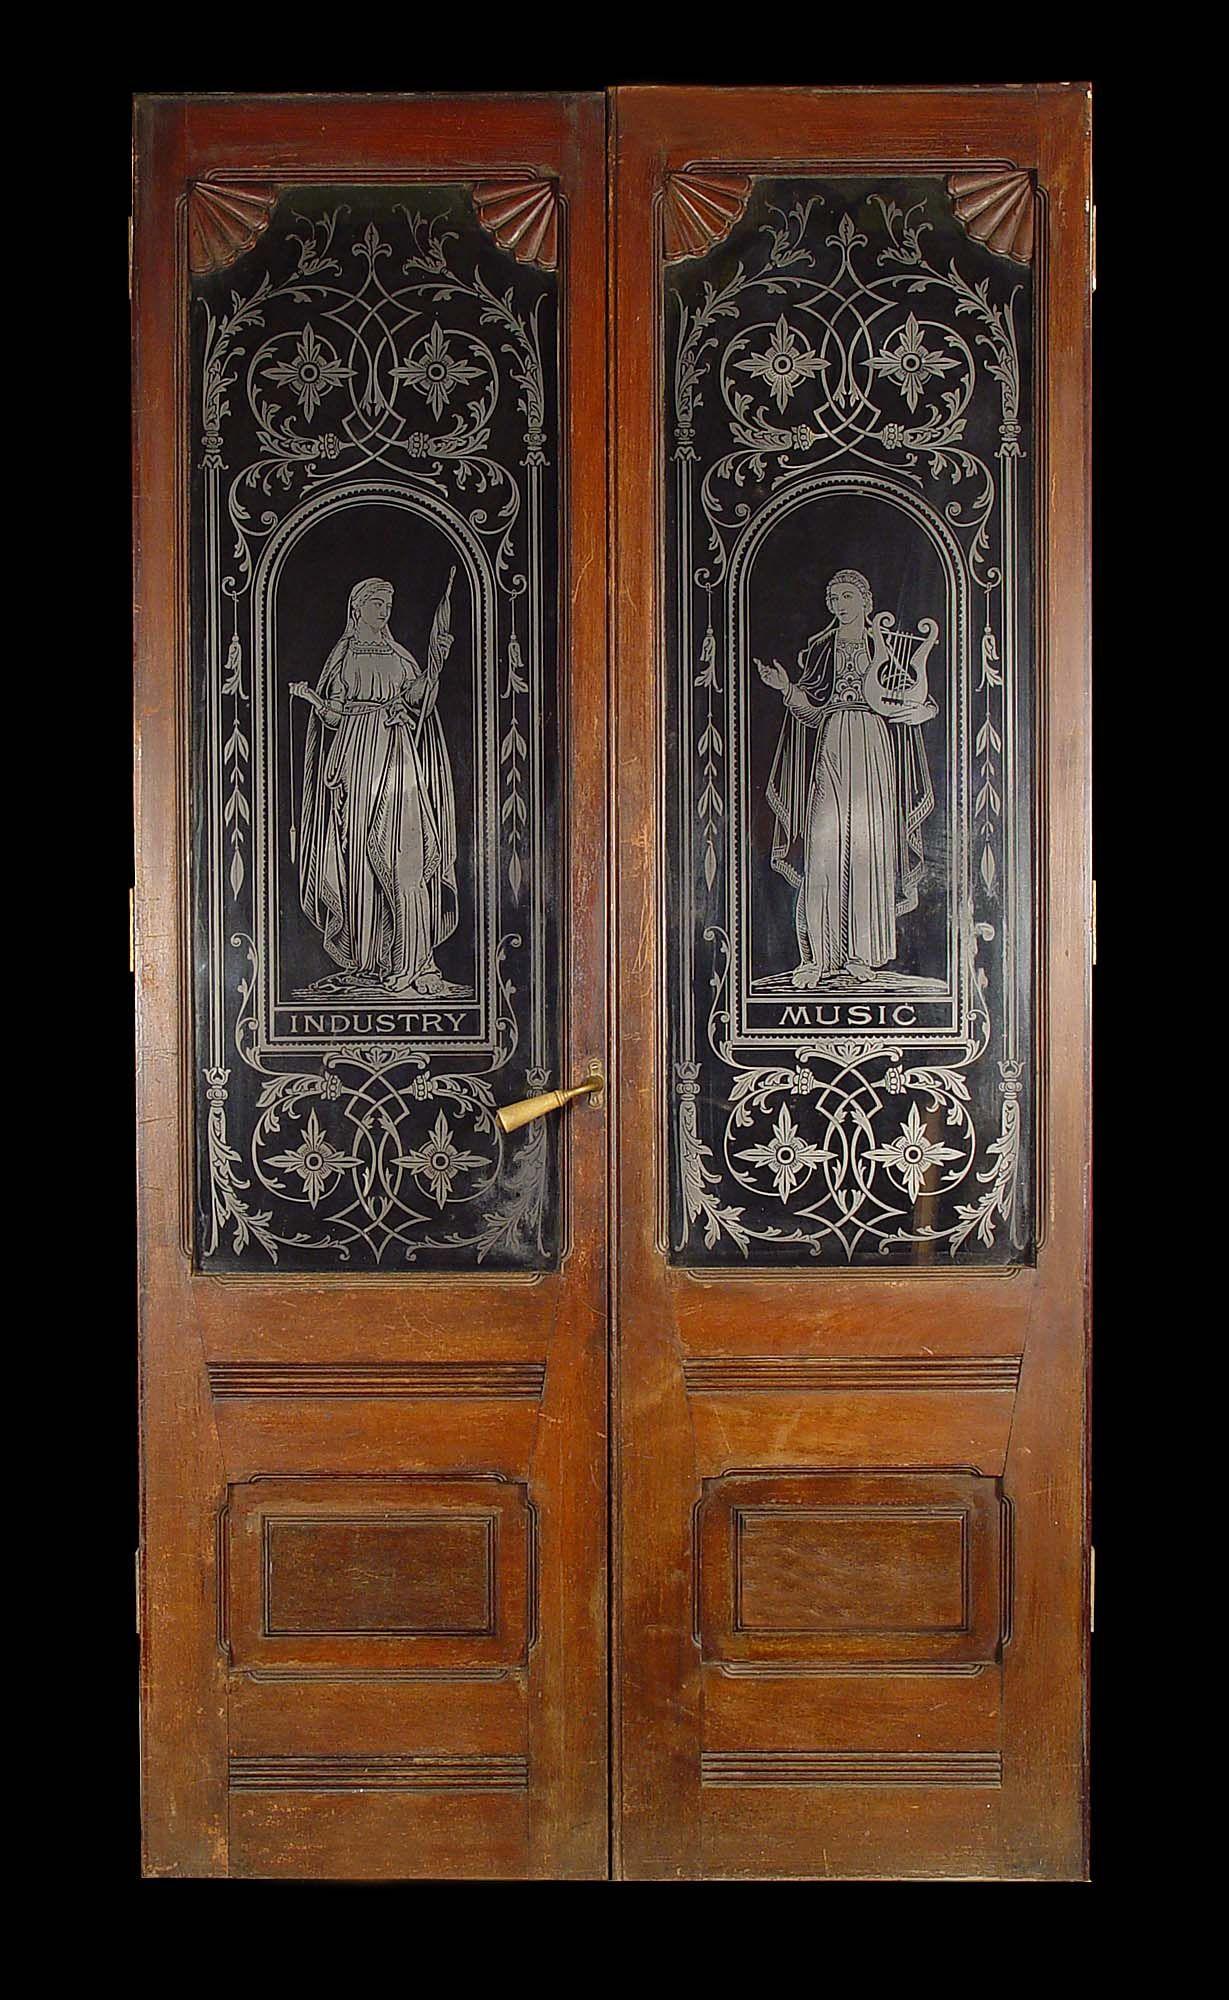 antique etched doors - Antique Etched Doors Etched Glass Pinterest Doors, Glass And